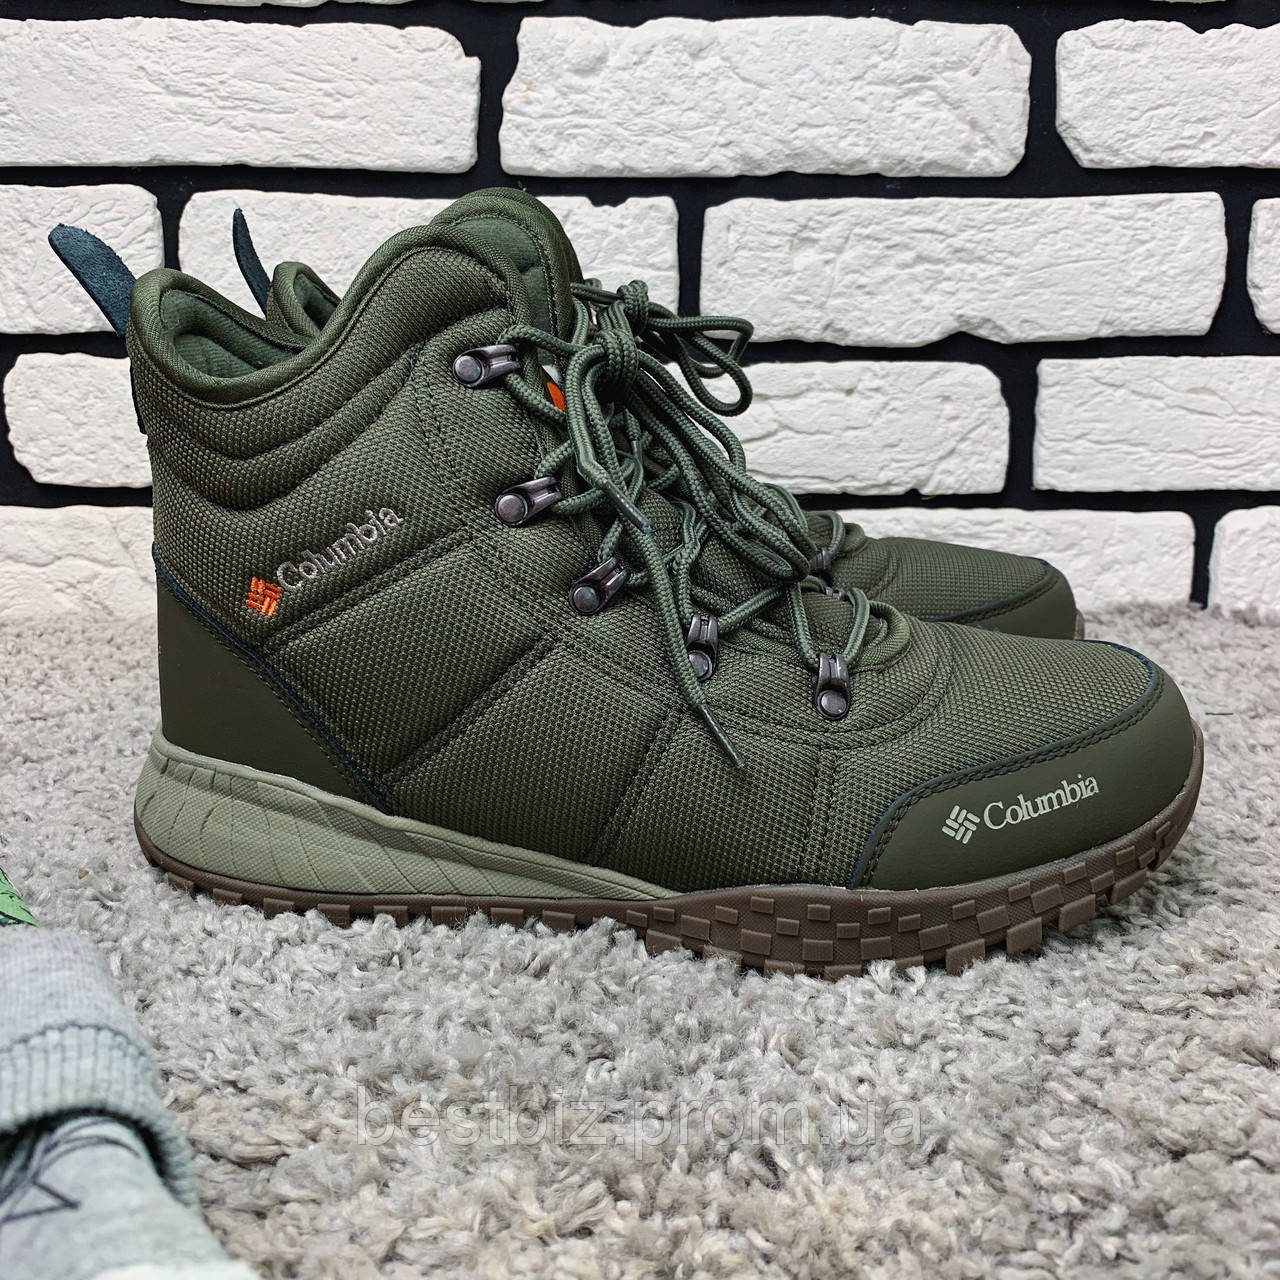 Зимние ботинки (на меху) Columbia 12-048 ⏩ [45 последний размер ]